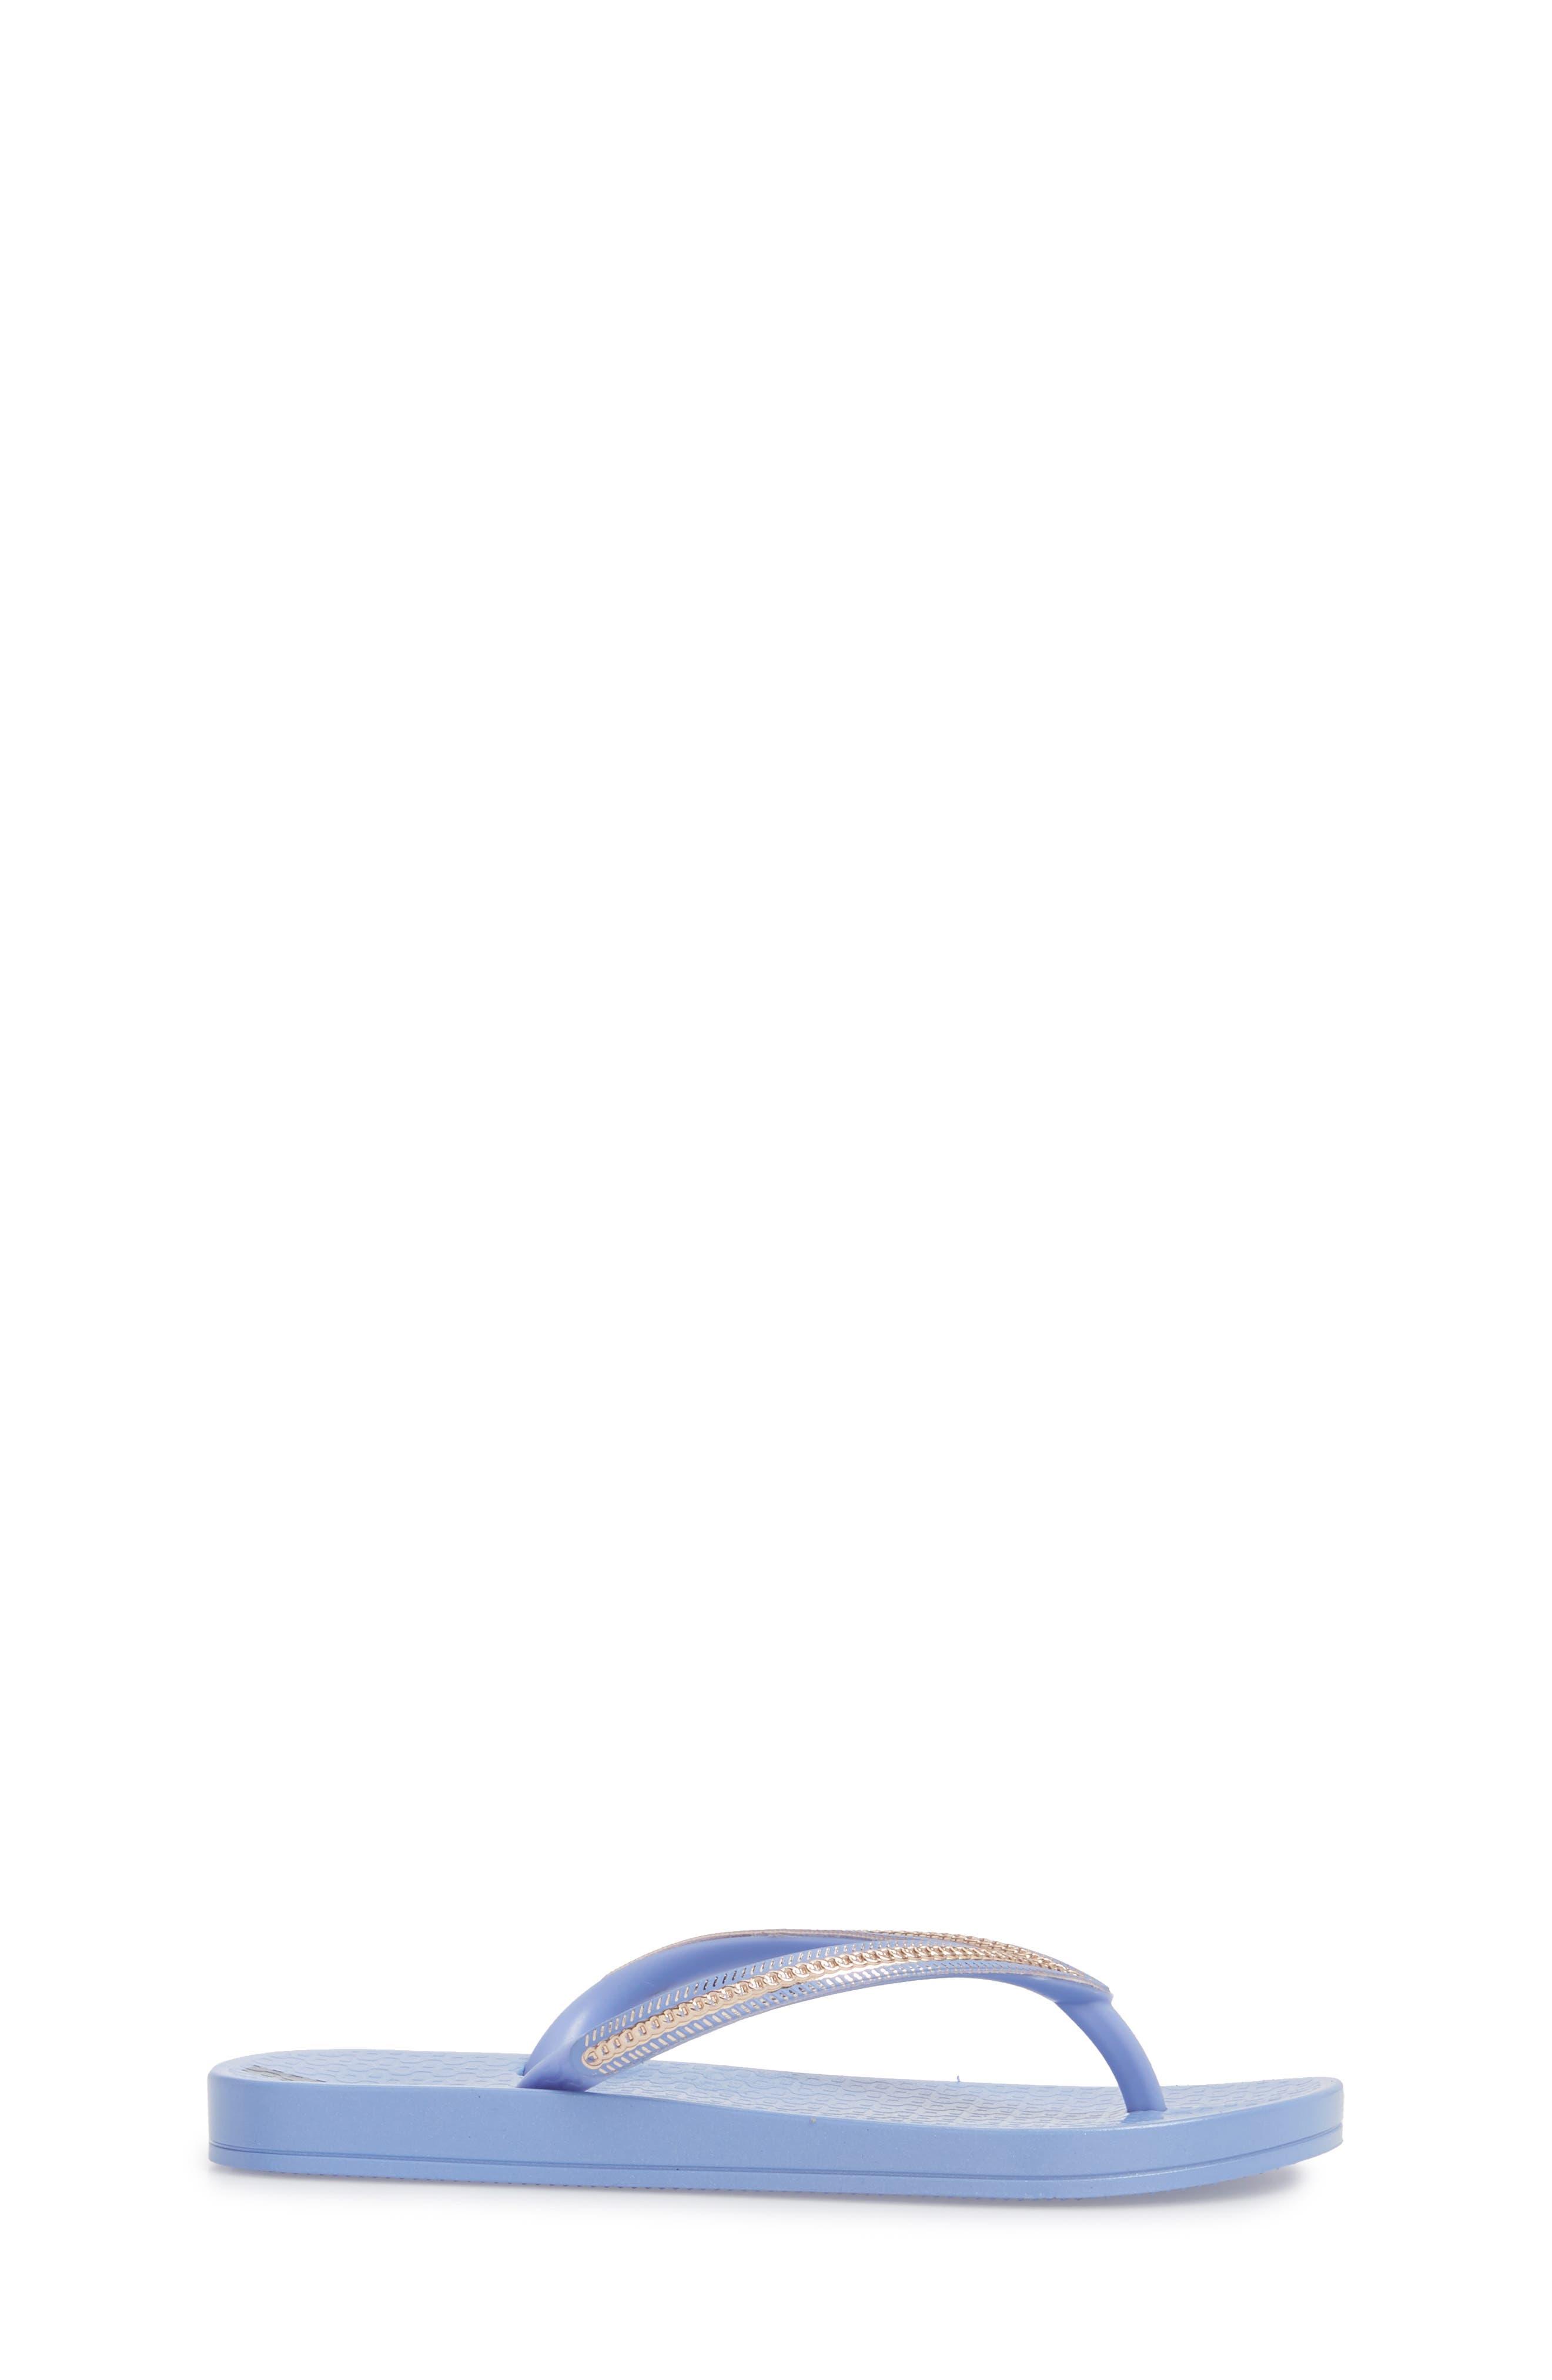 Ana Metallic Flip Flop,                             Alternate thumbnail 3, color,                             Blue/ Rose